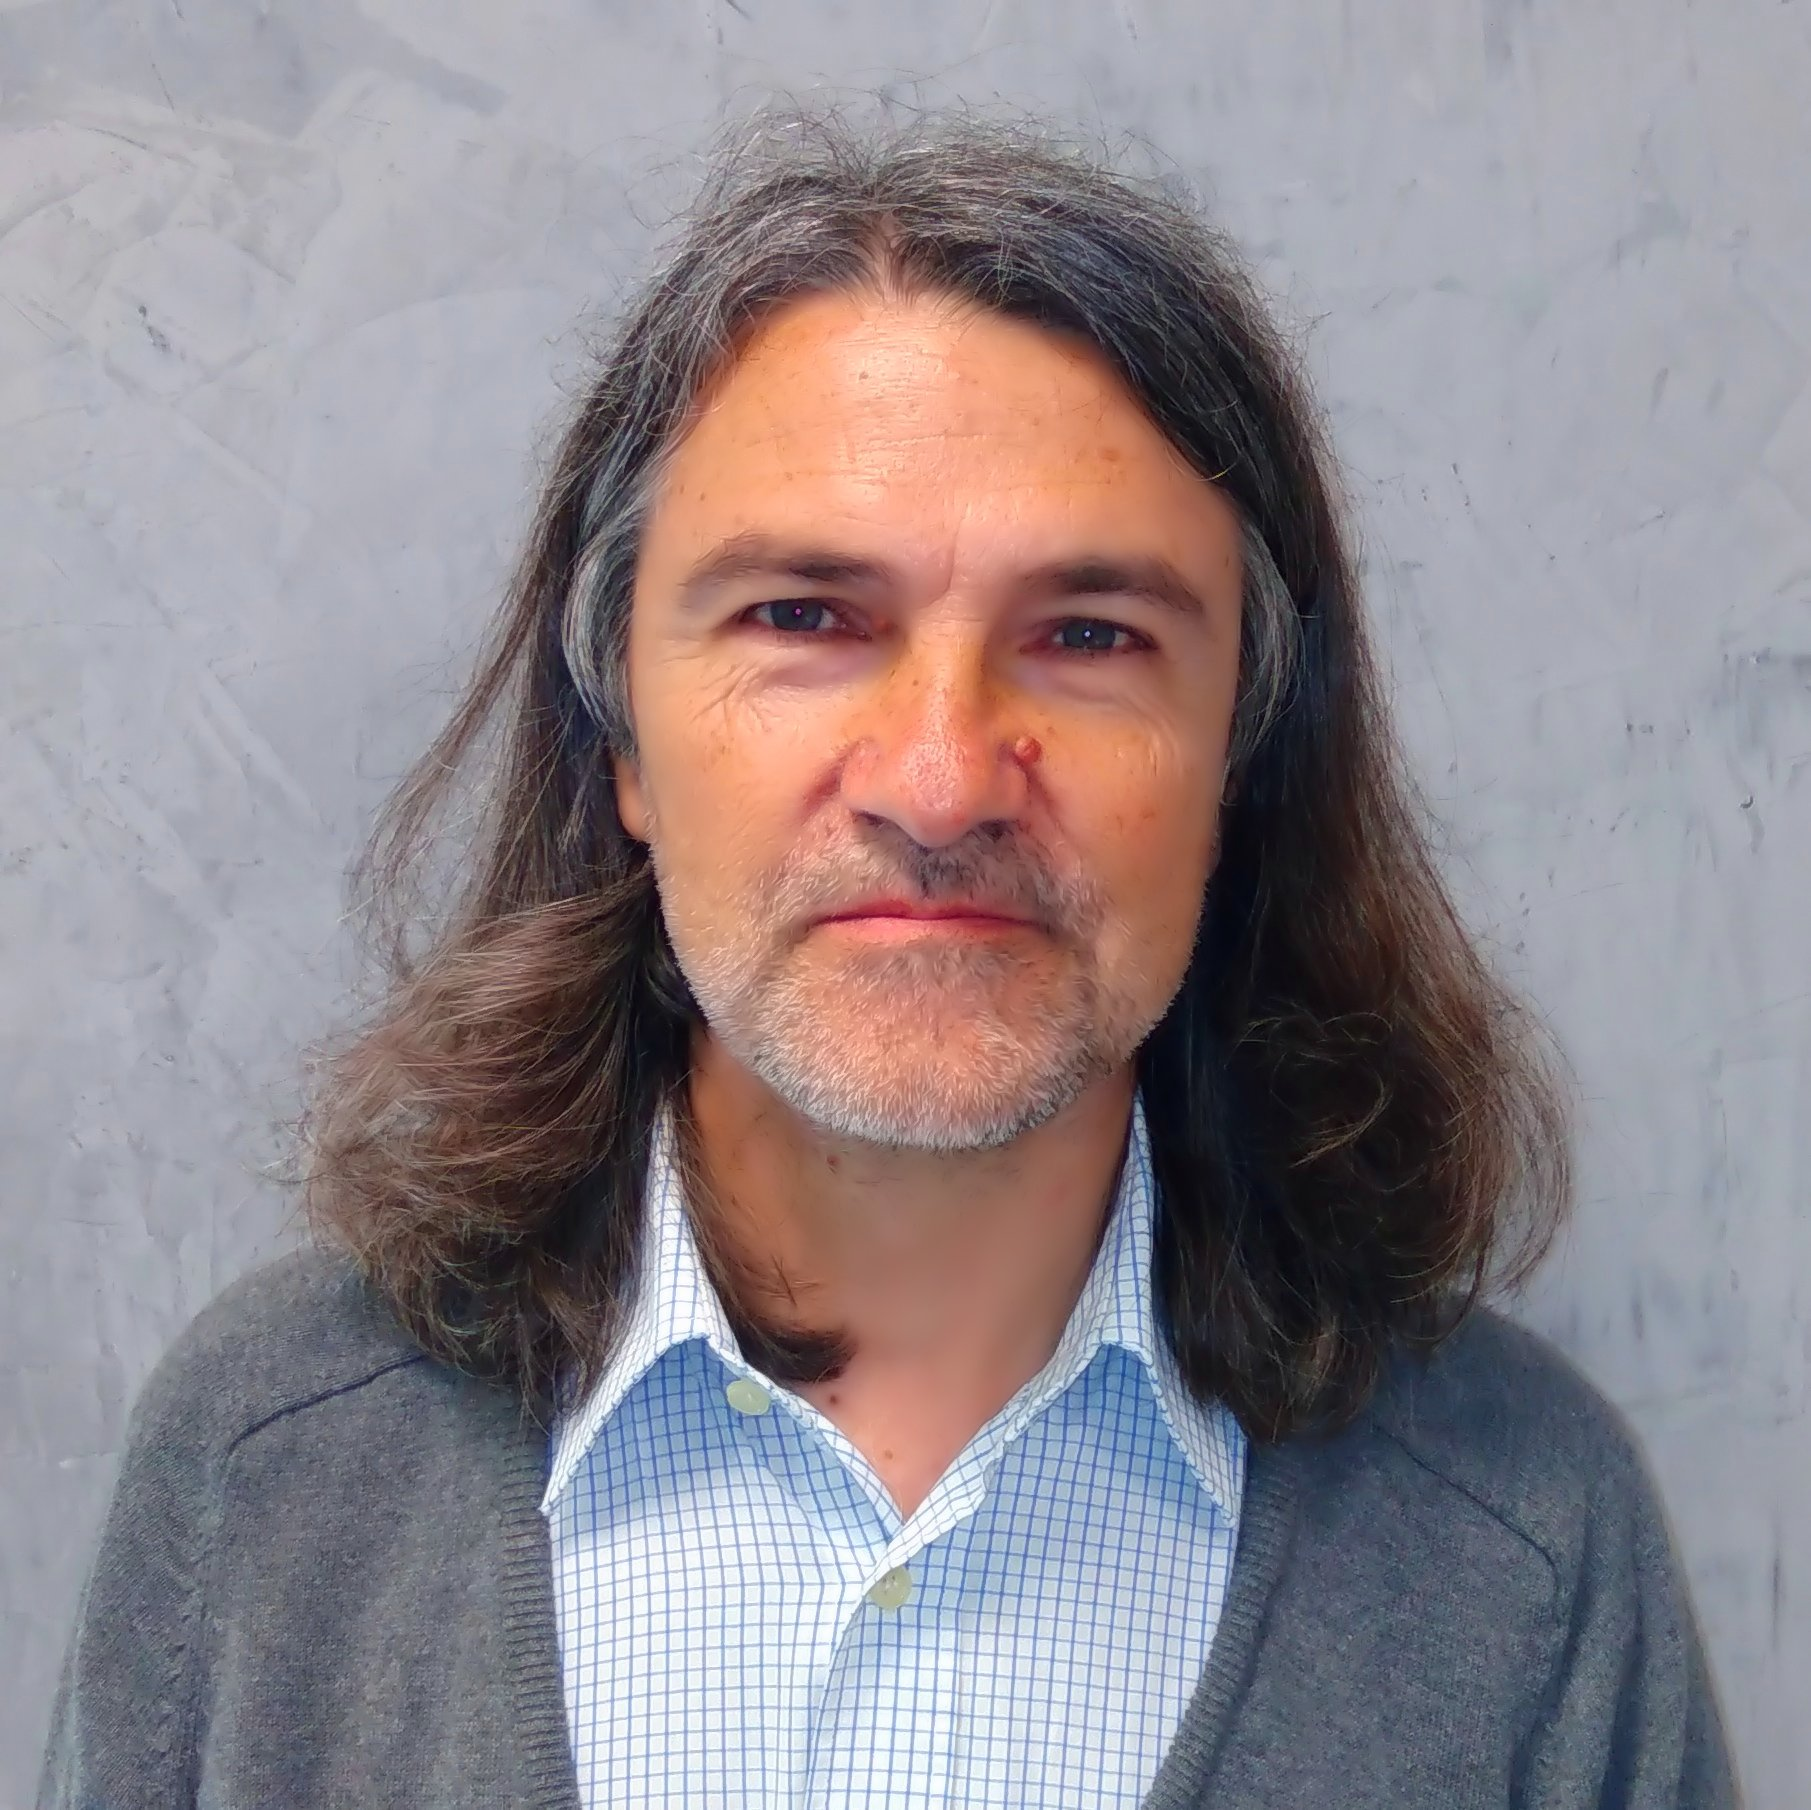 Manel Martí